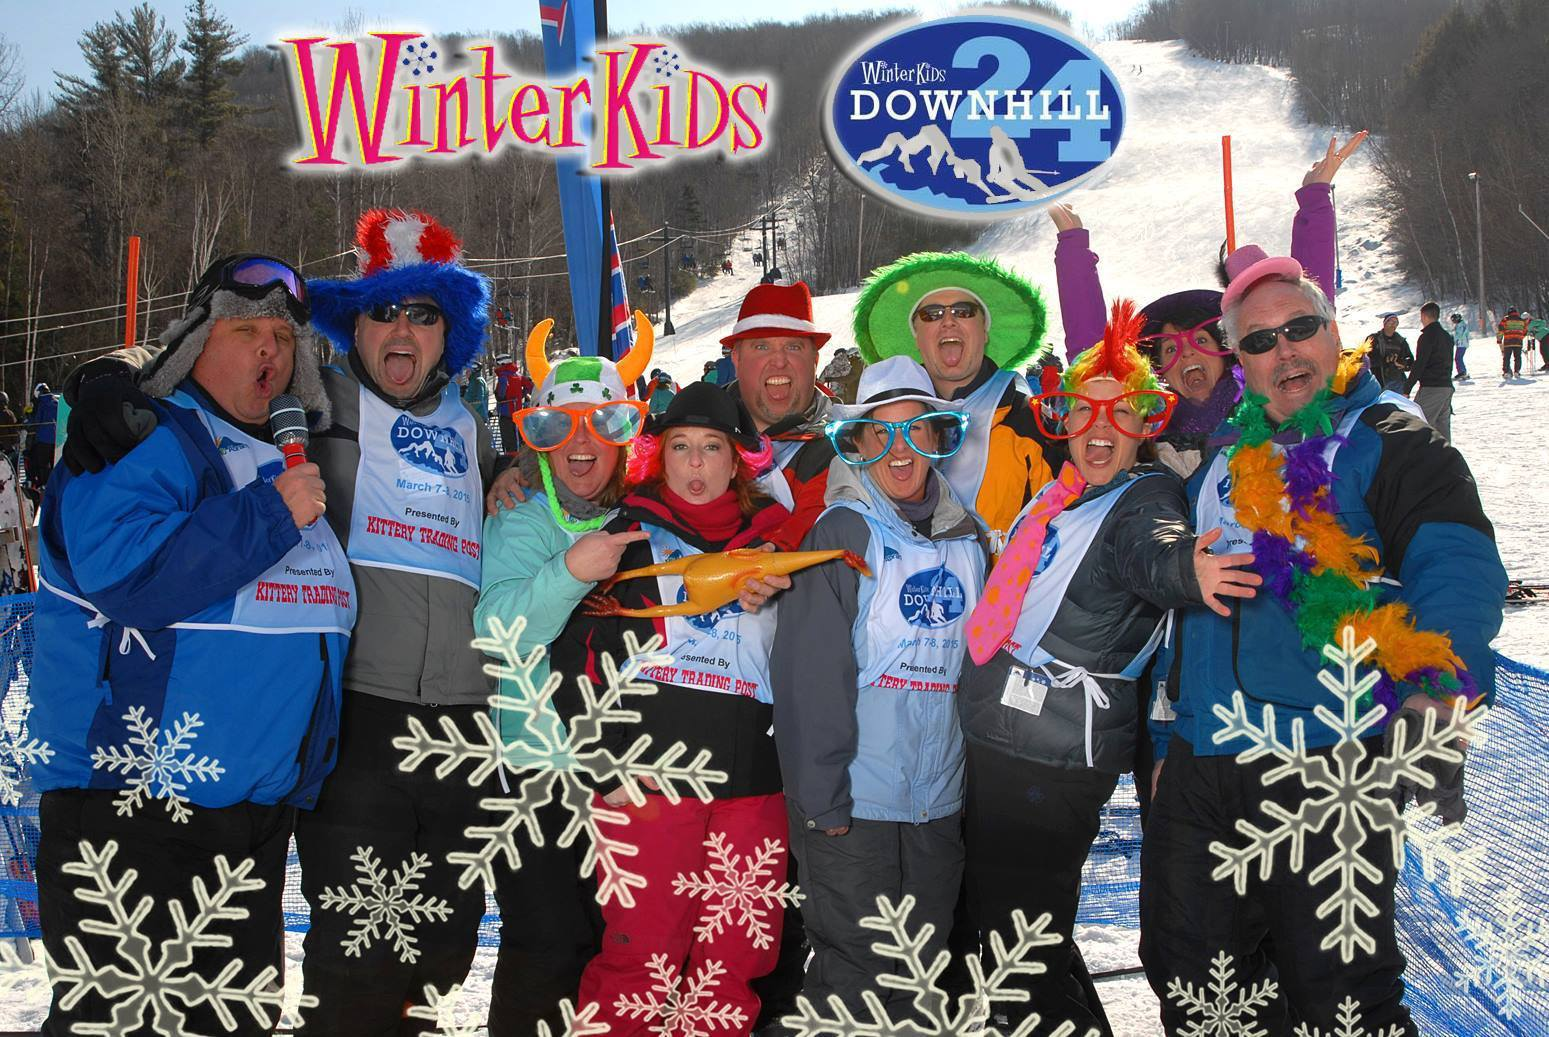 WinterKids Downhill24 2015 Photo Booth037